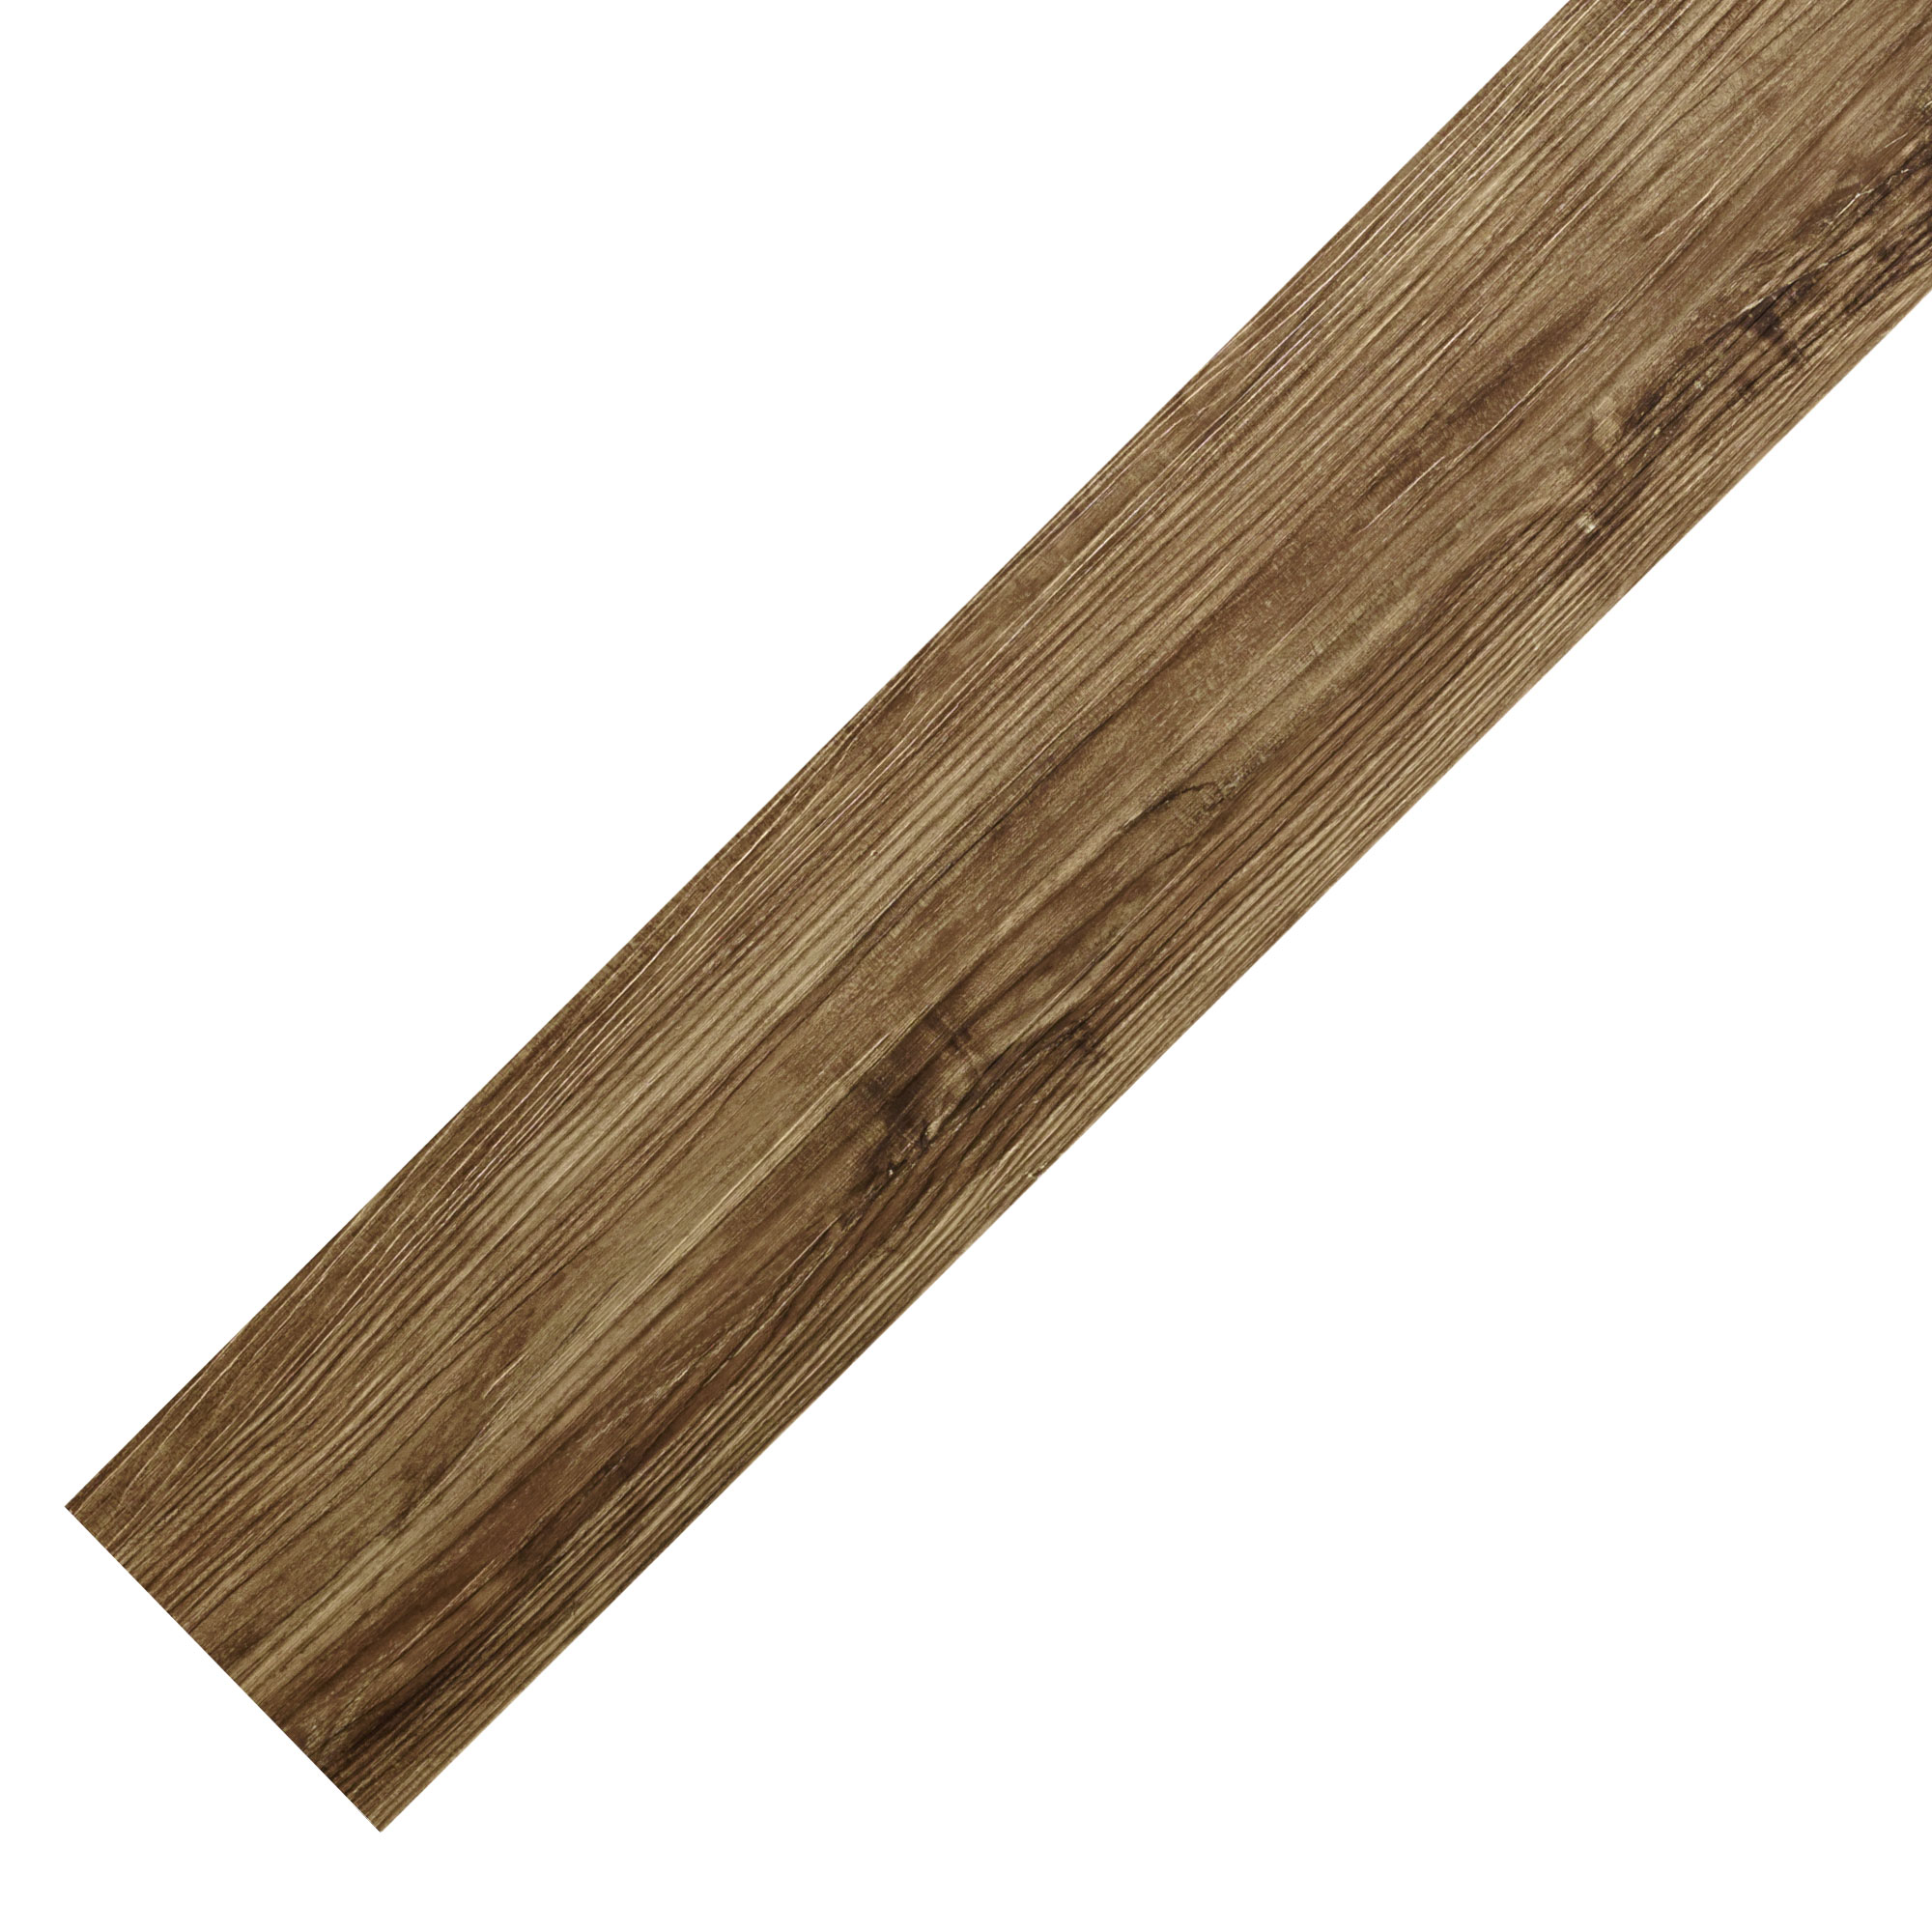 neuholz about 4m vinyl laminate self adhesive wenge matte flooring planks ebay. Black Bedroom Furniture Sets. Home Design Ideas